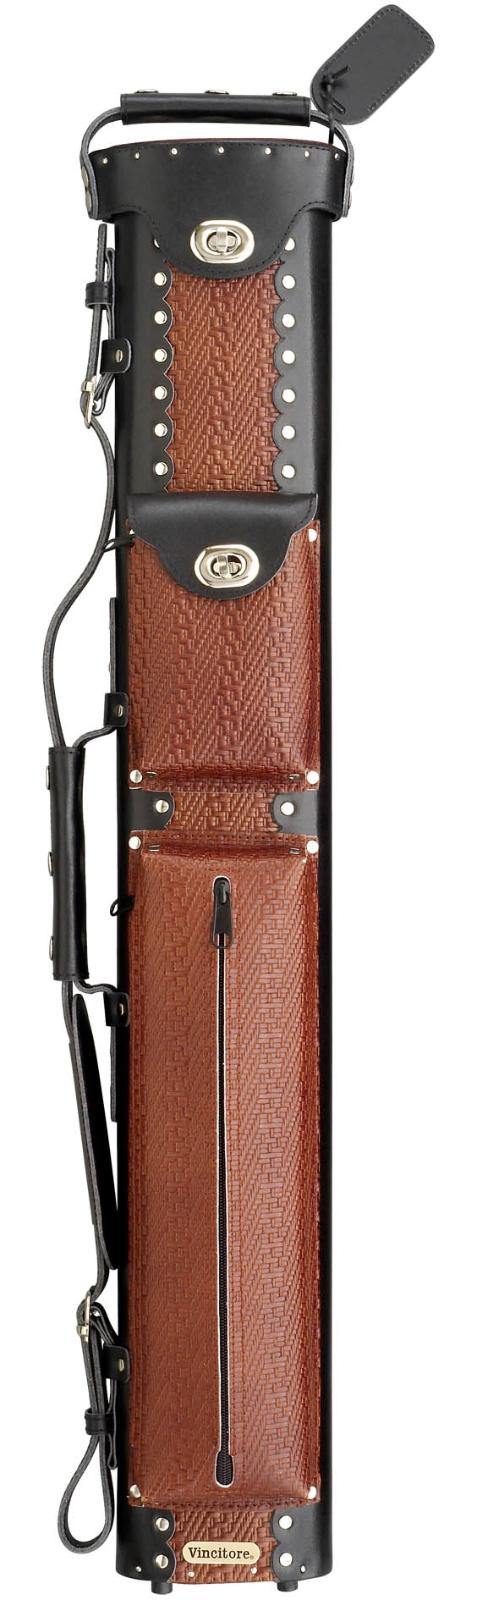 ISB24 New Instroke Buffalo Leather 2x4 Cue Case